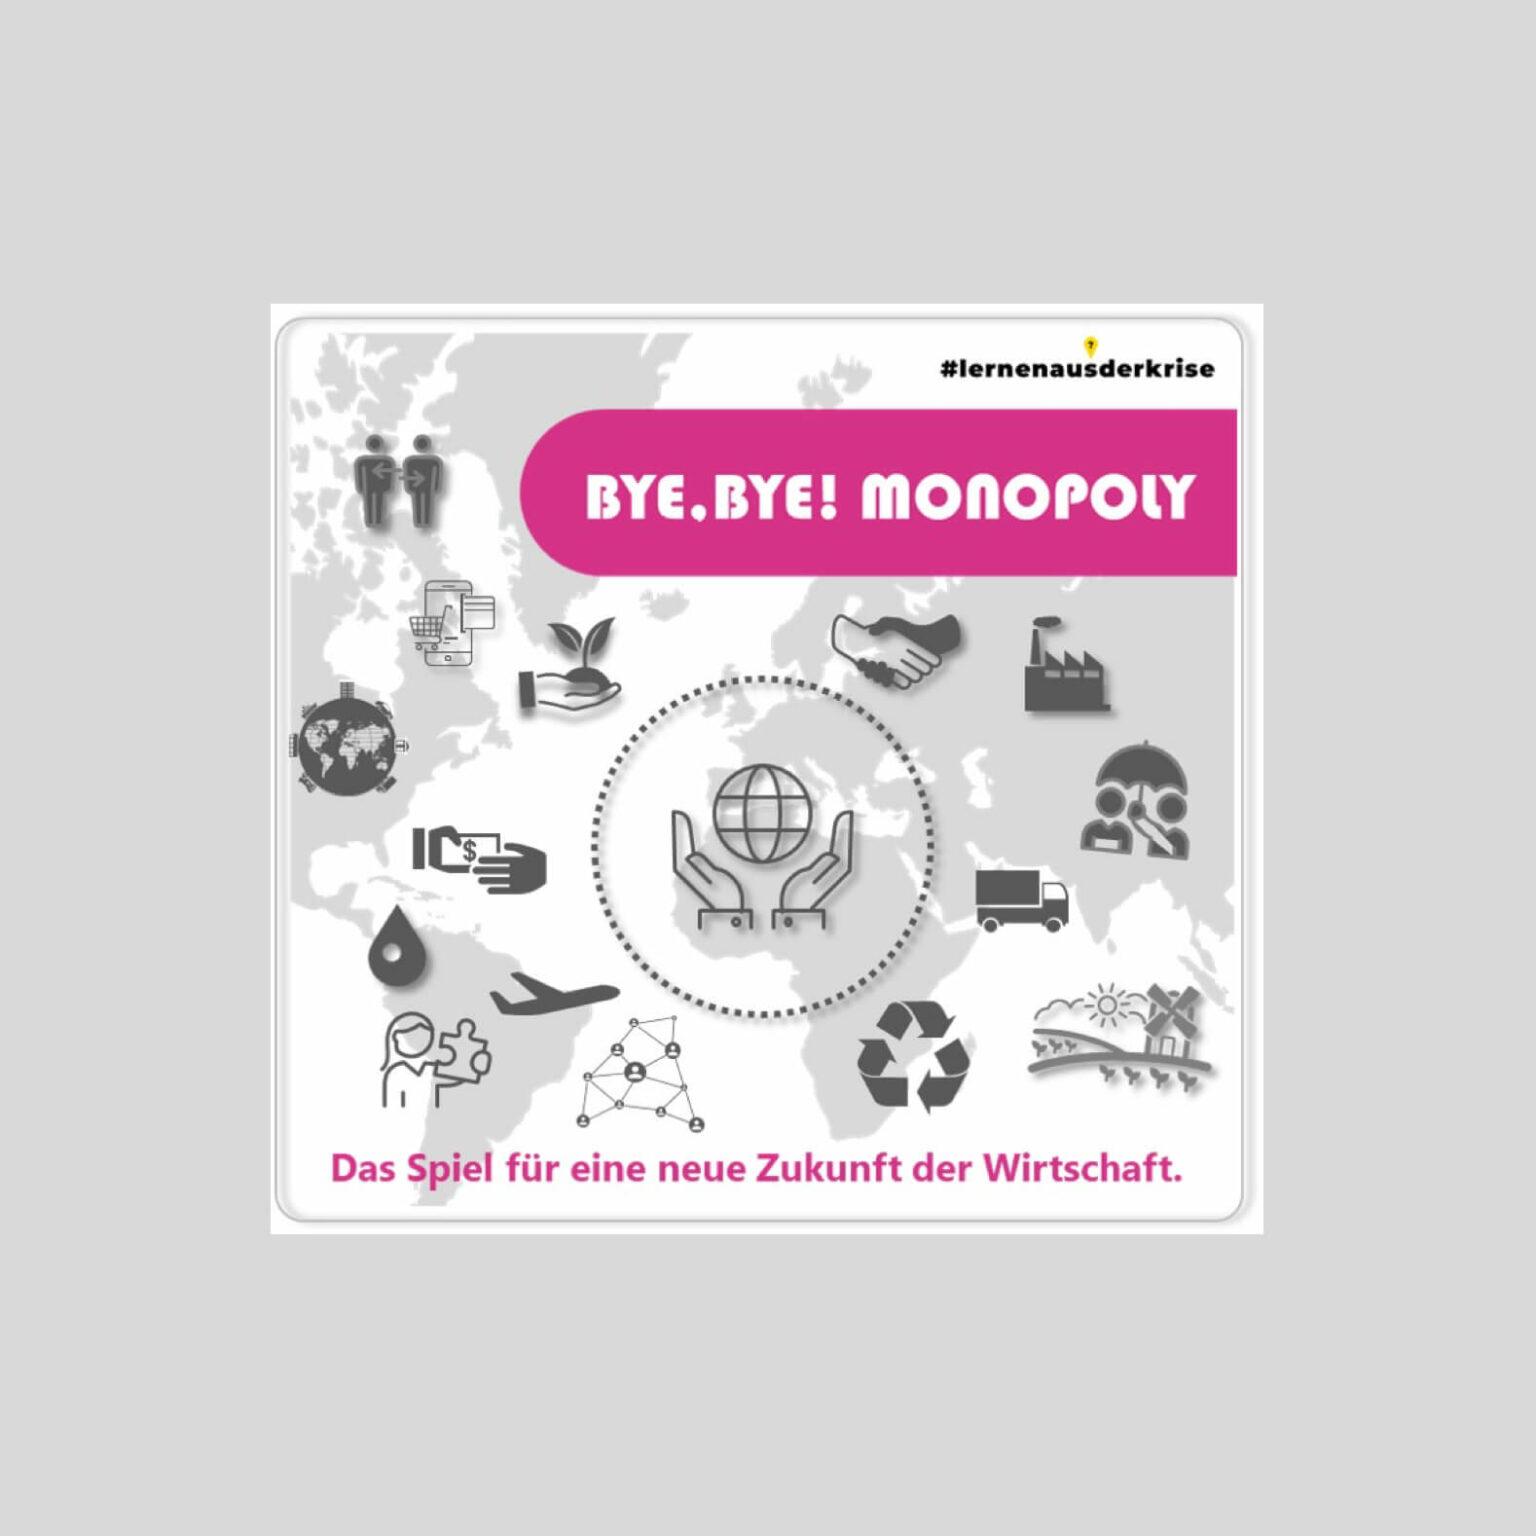 bye bye monopoly - the game